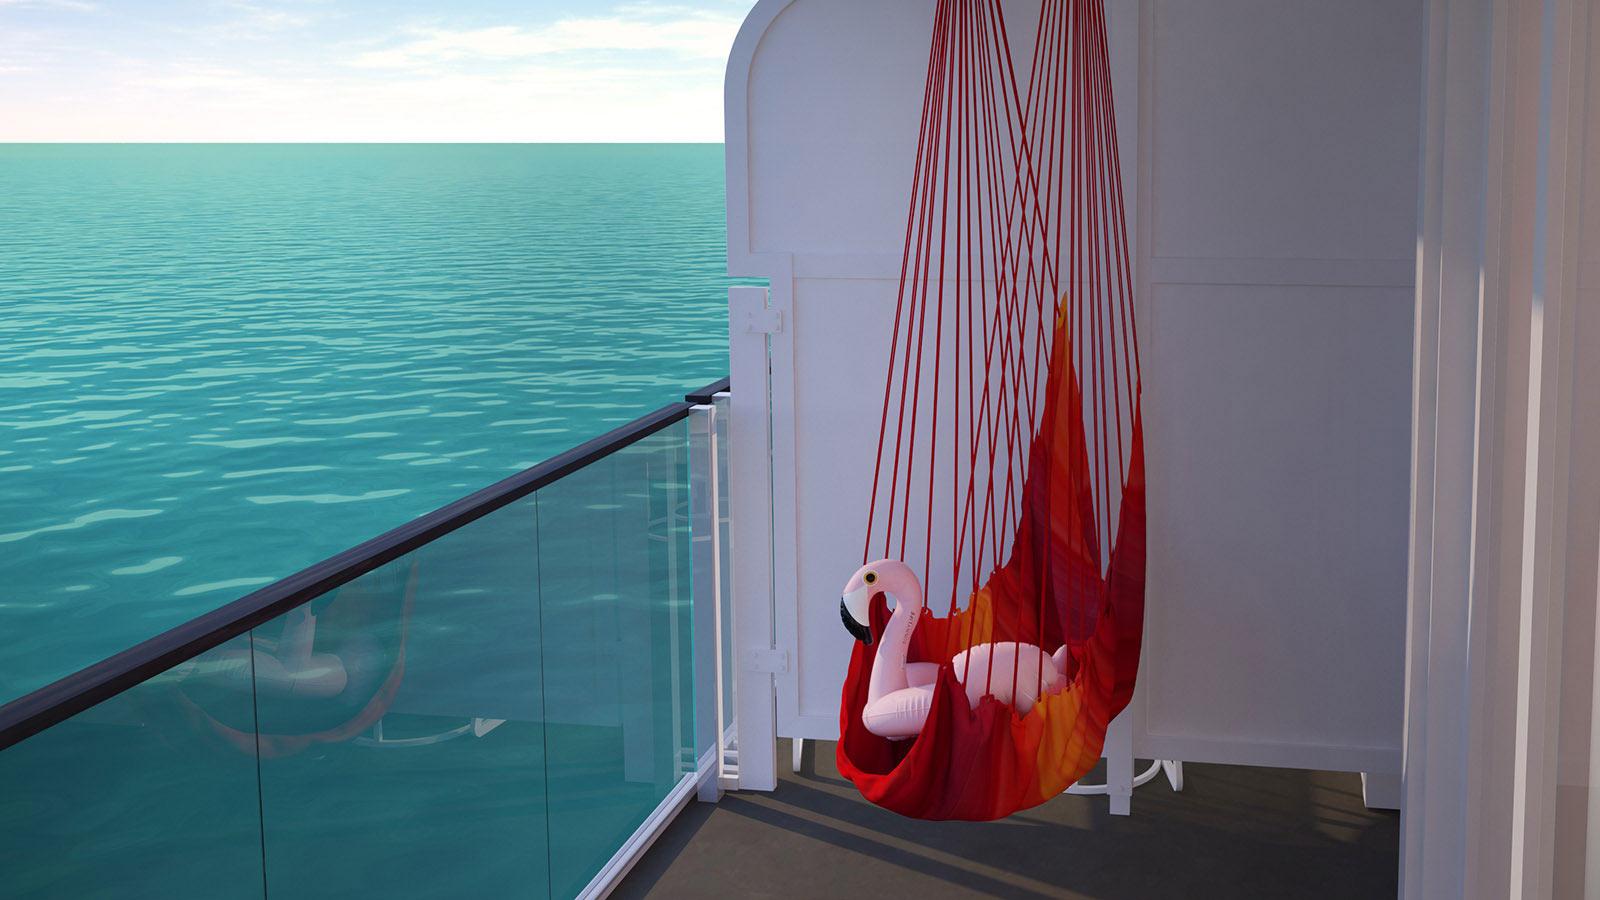 RDR-CAB-sea-terrace-cabin-day-v5-04-1600x900.jpg